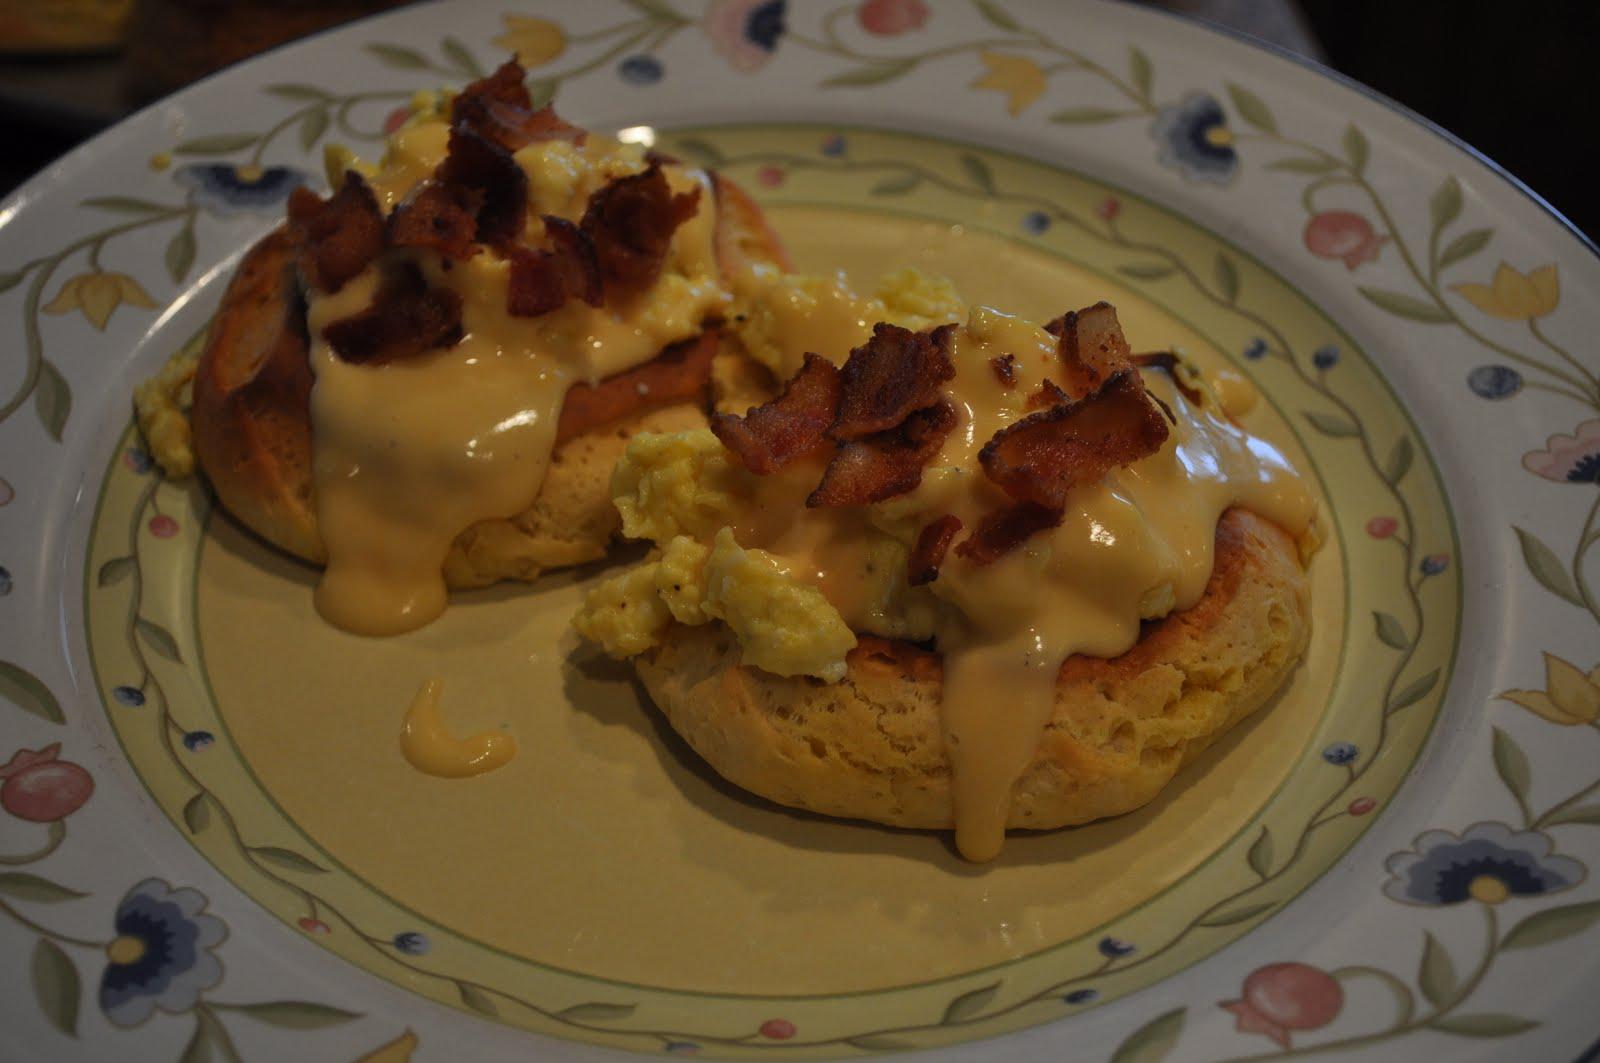 Beth's Favorite Recipes: December 2010